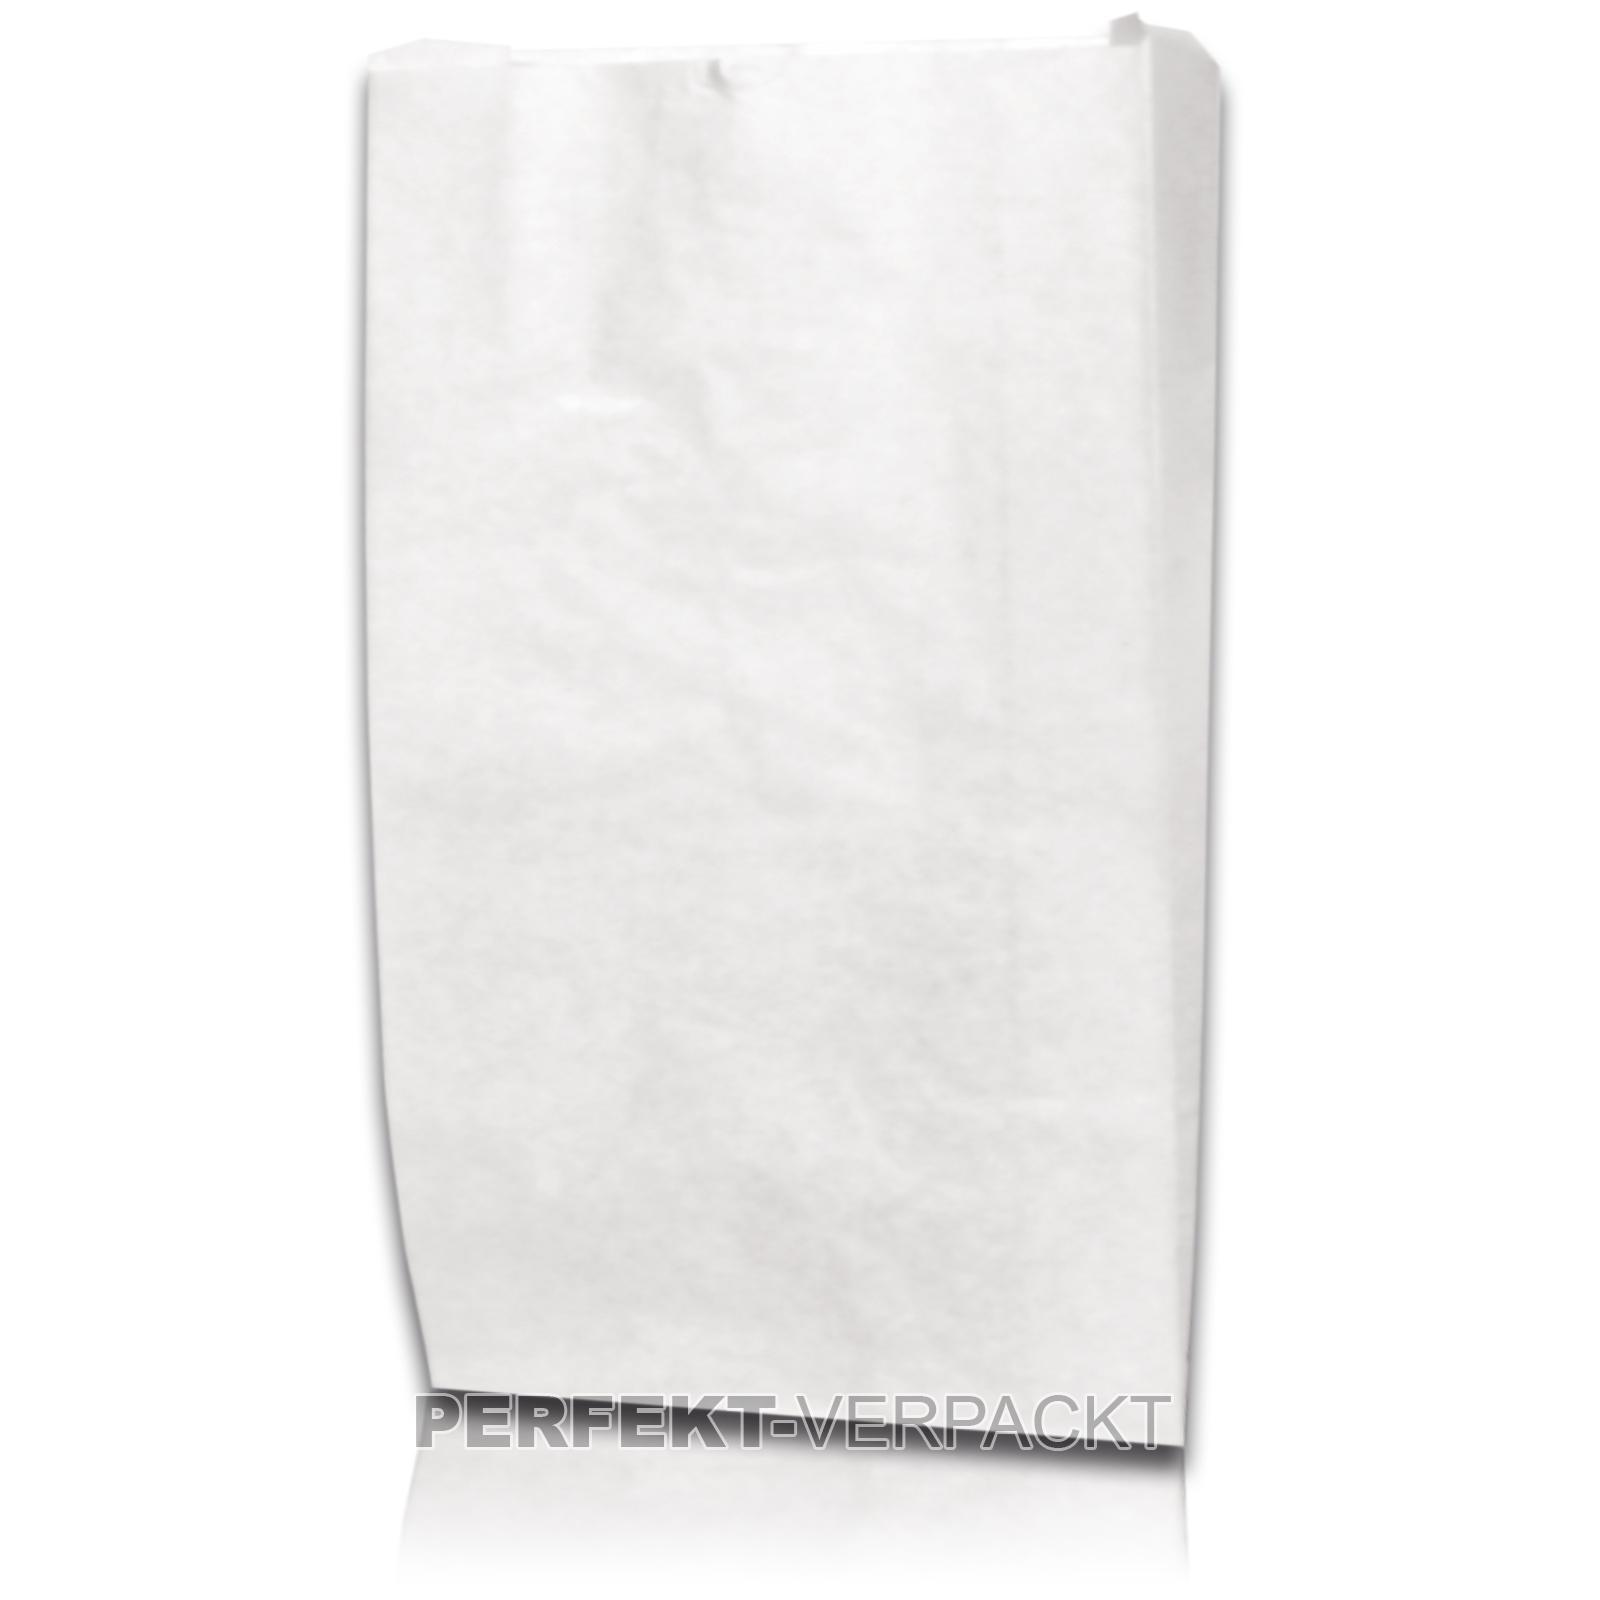 1.000 Faltenbeutel 12x5x23cm #54a  weiß unbedruckt Pergamentersatz